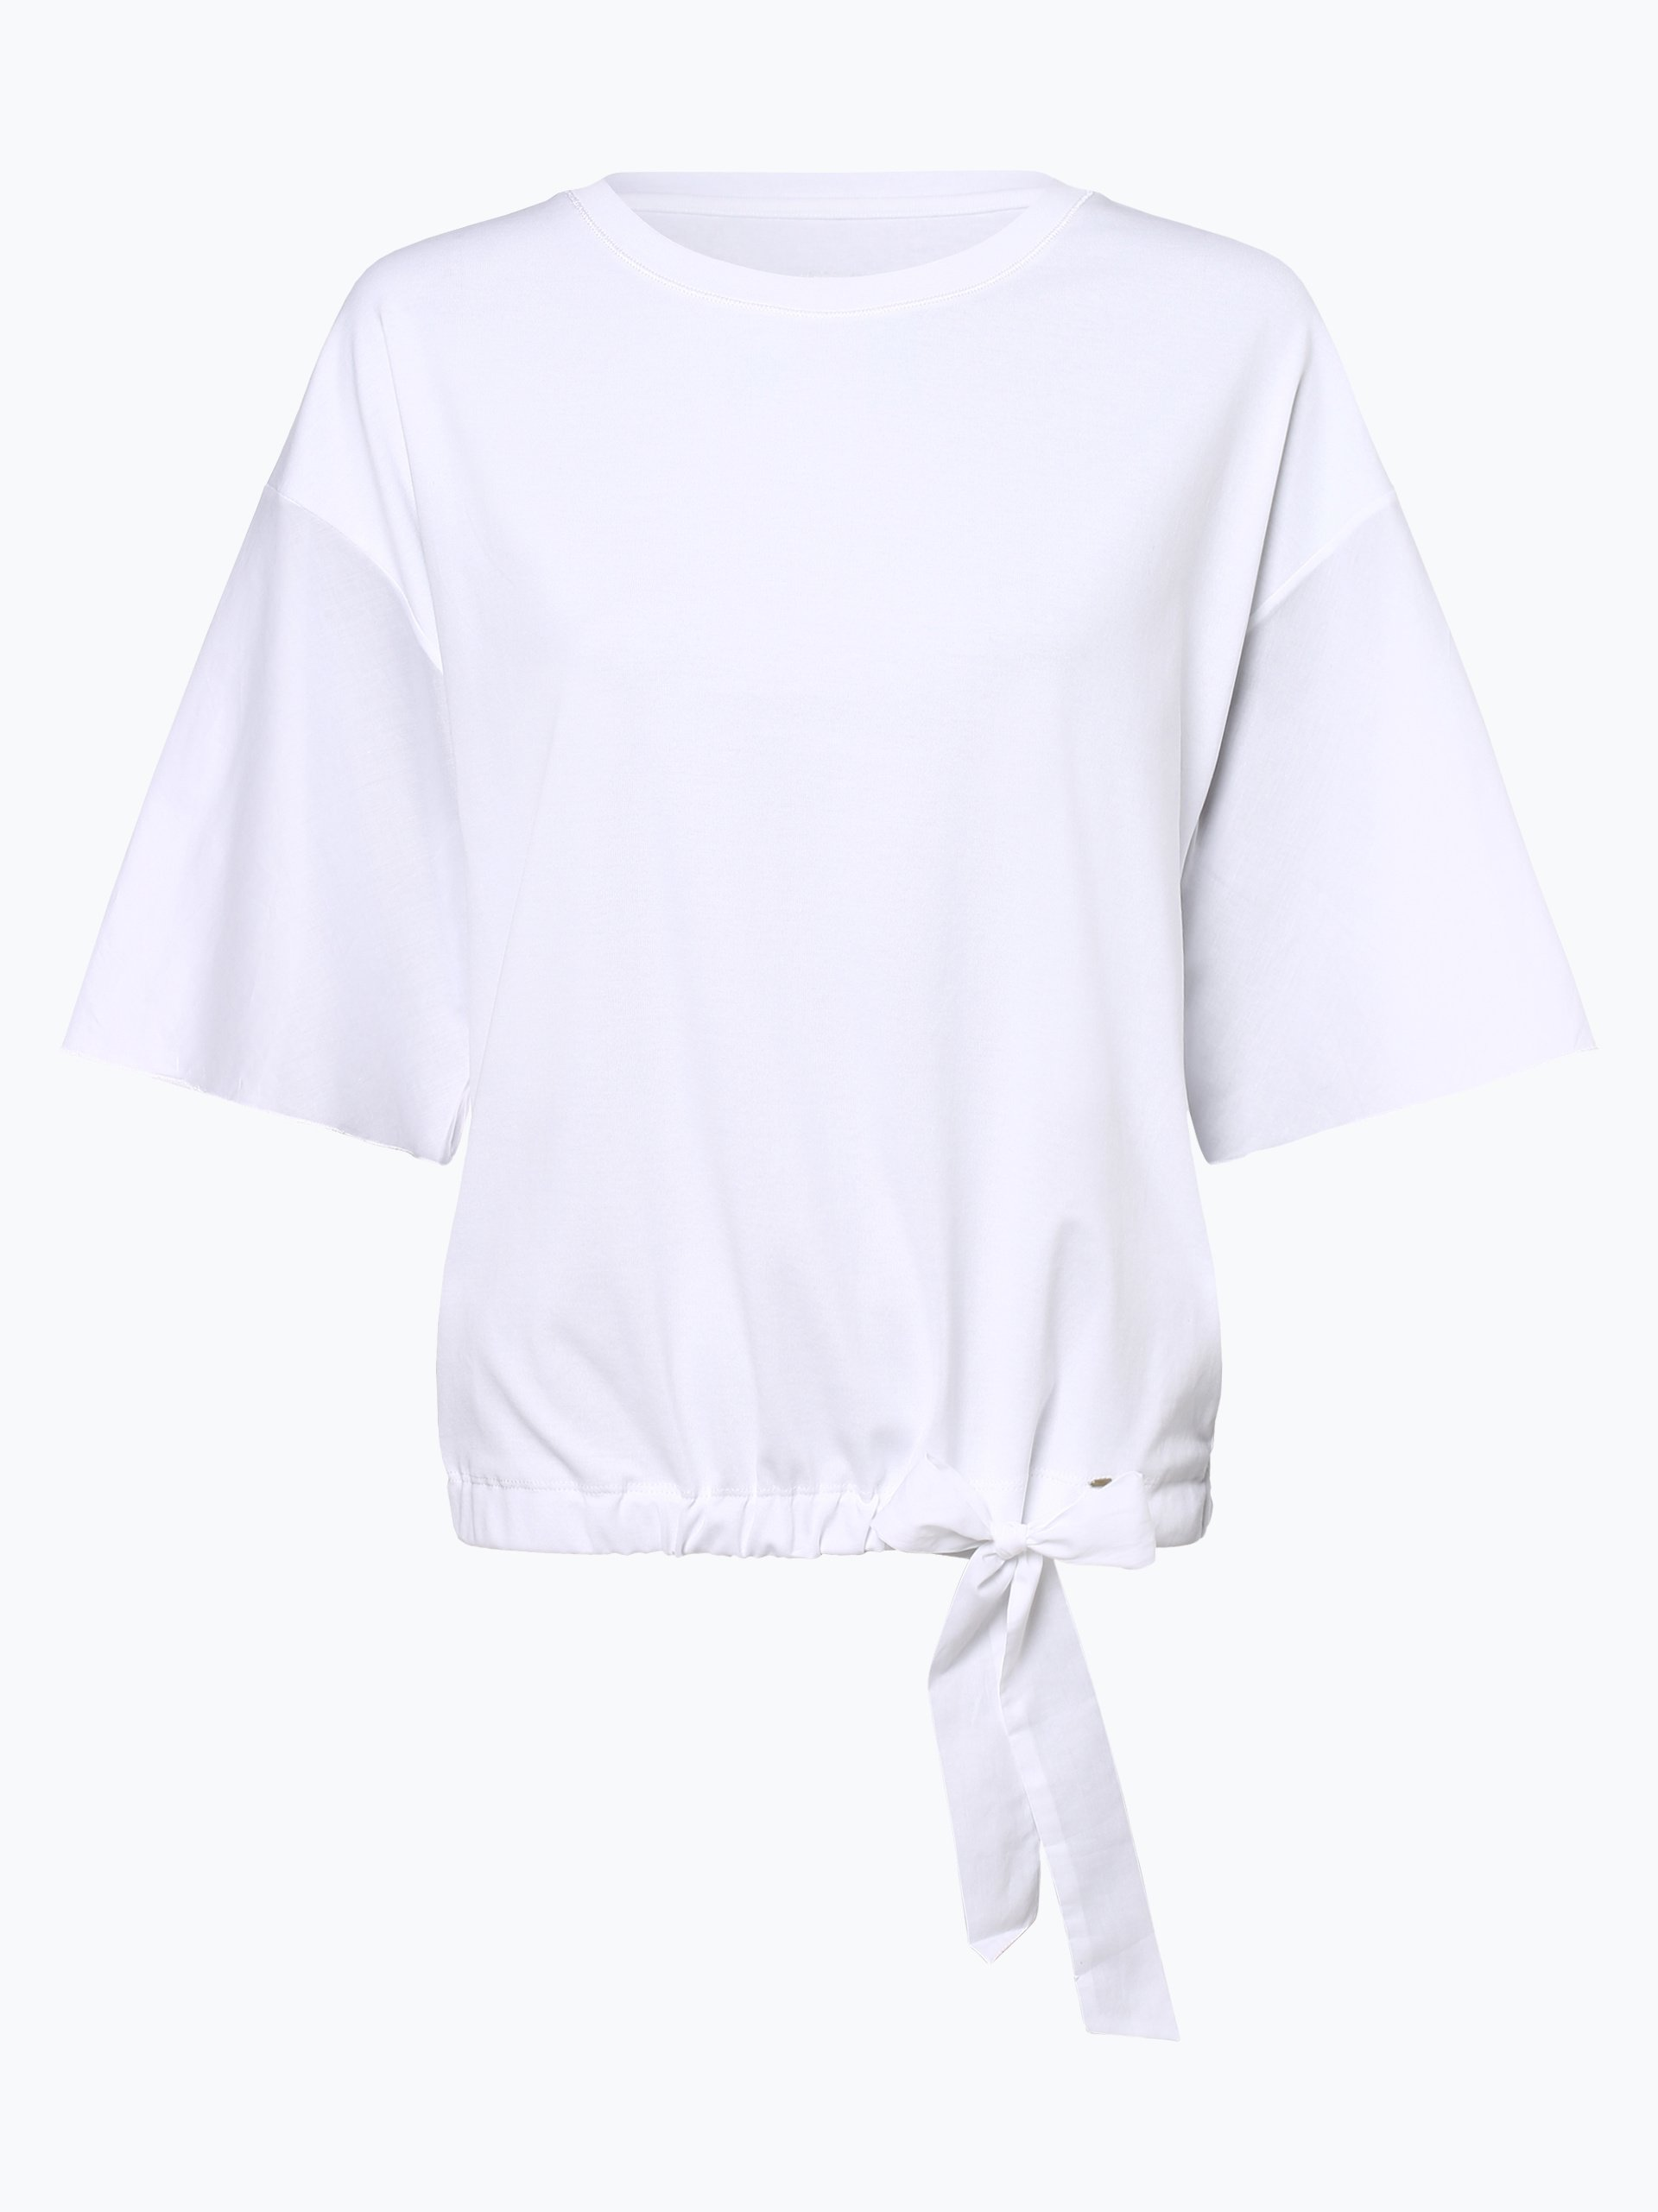 Marc Cain Collections T-shirt damski